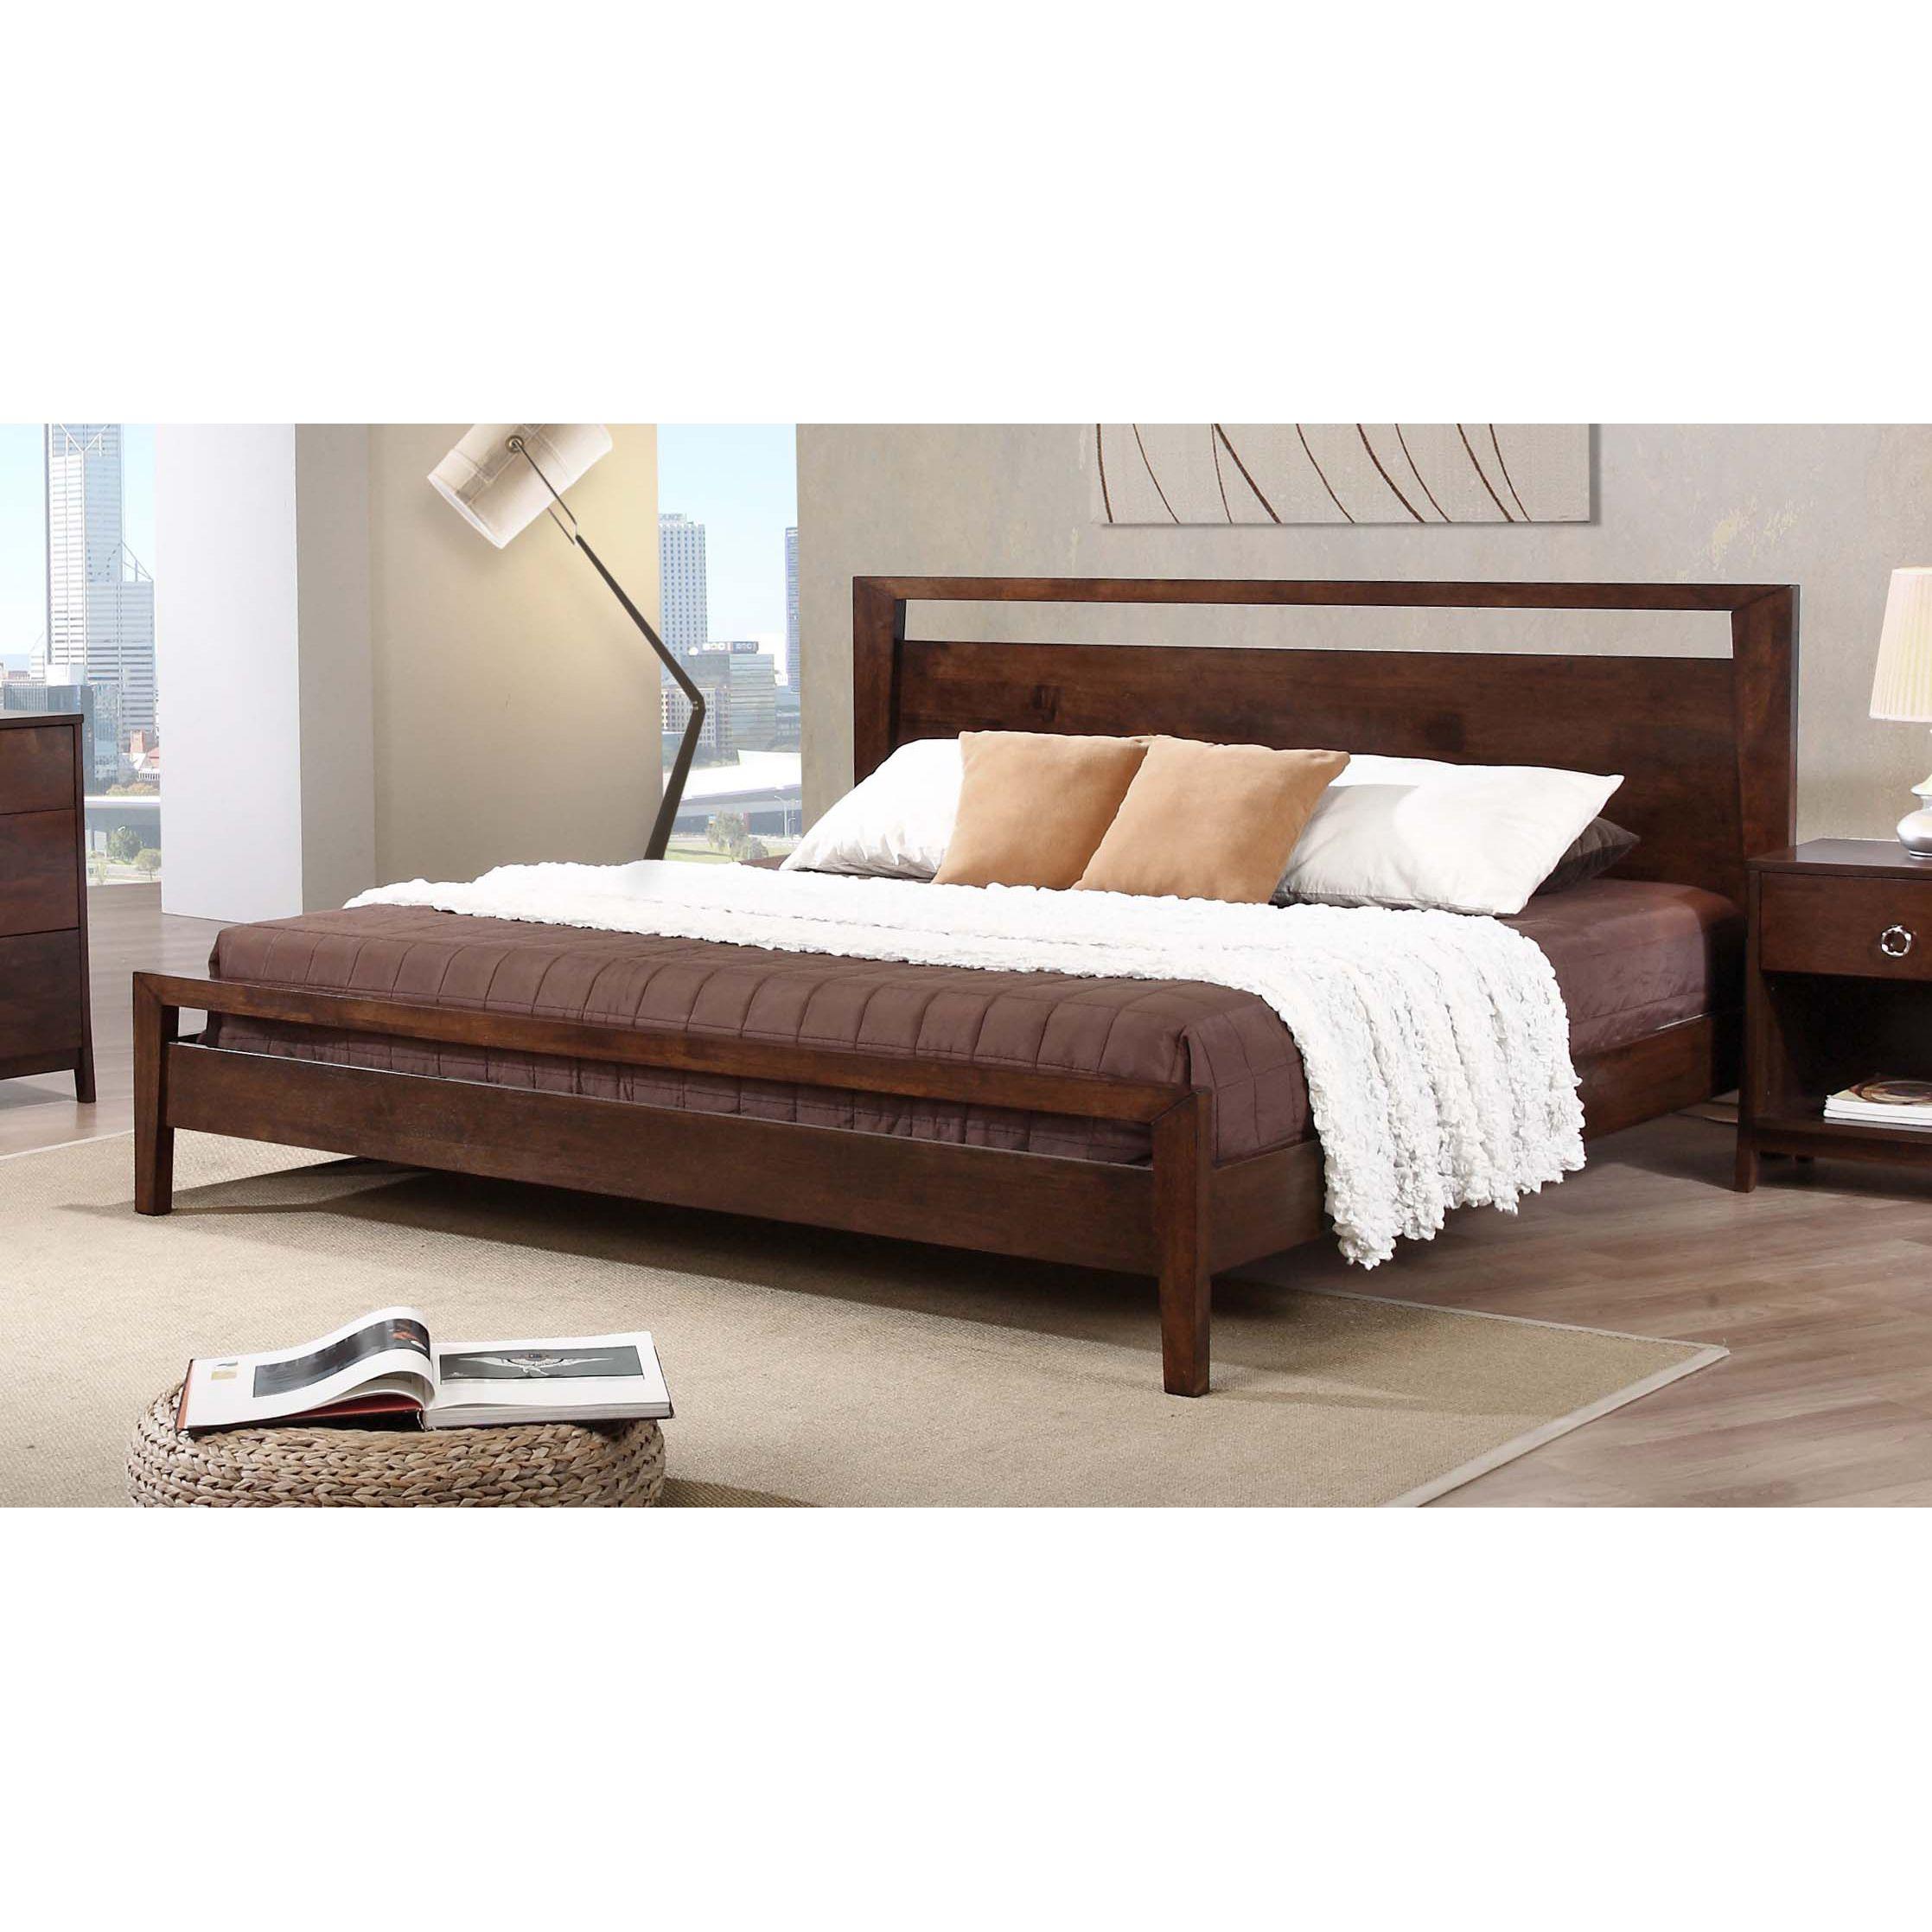 kota kingsize platform bed by i love living  king size platform  - give your bedroom a modern touch with this stylish kingsize platform bedmade